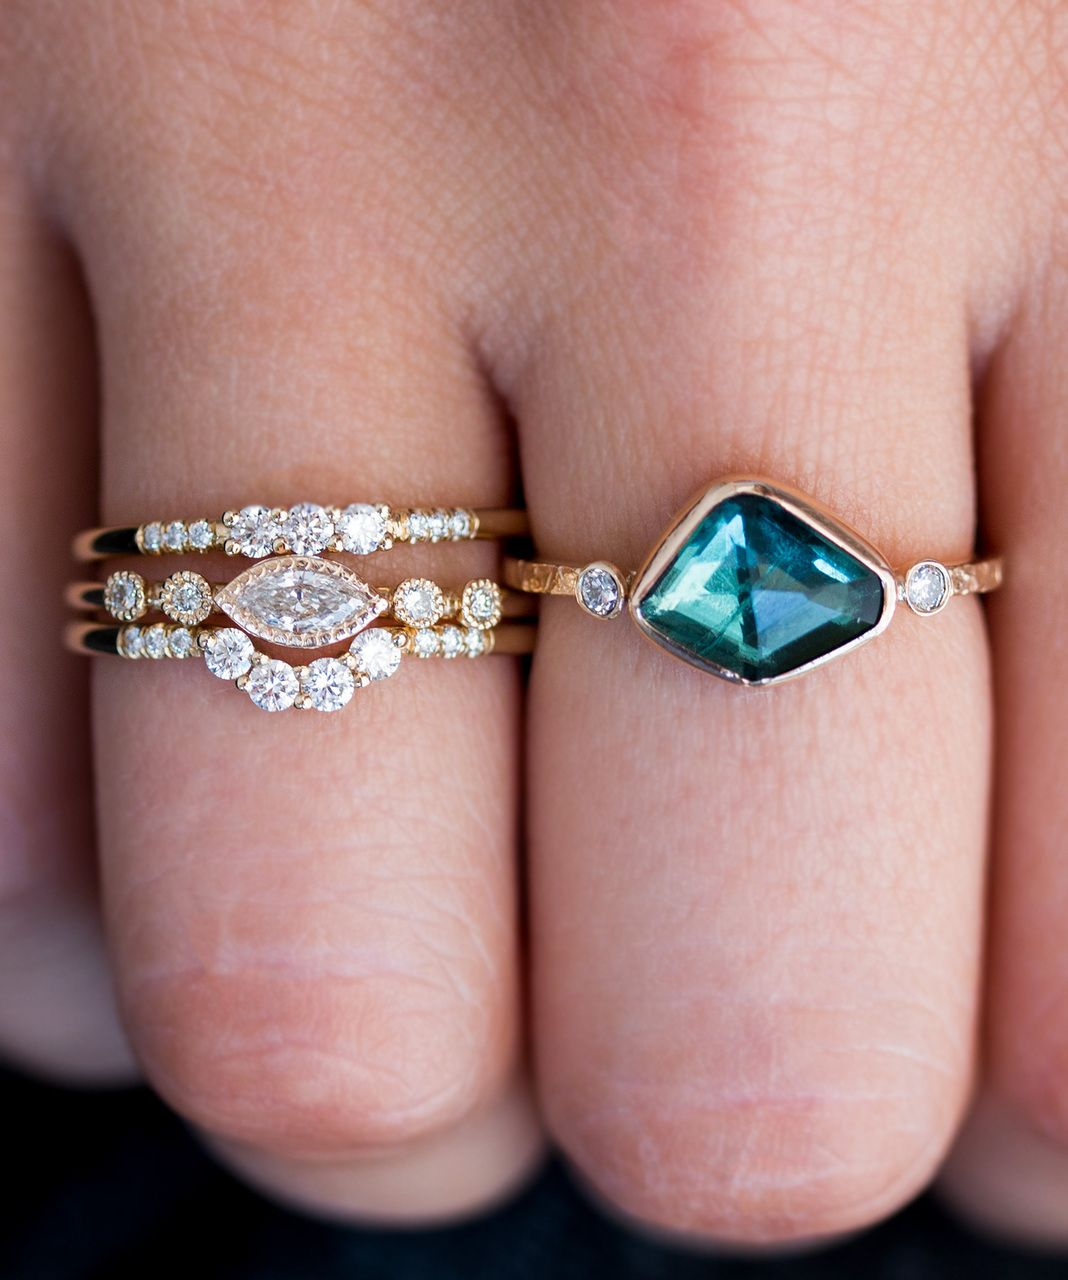 Diamond Arch Ring | Pinterest | Display, Ring and Diamond